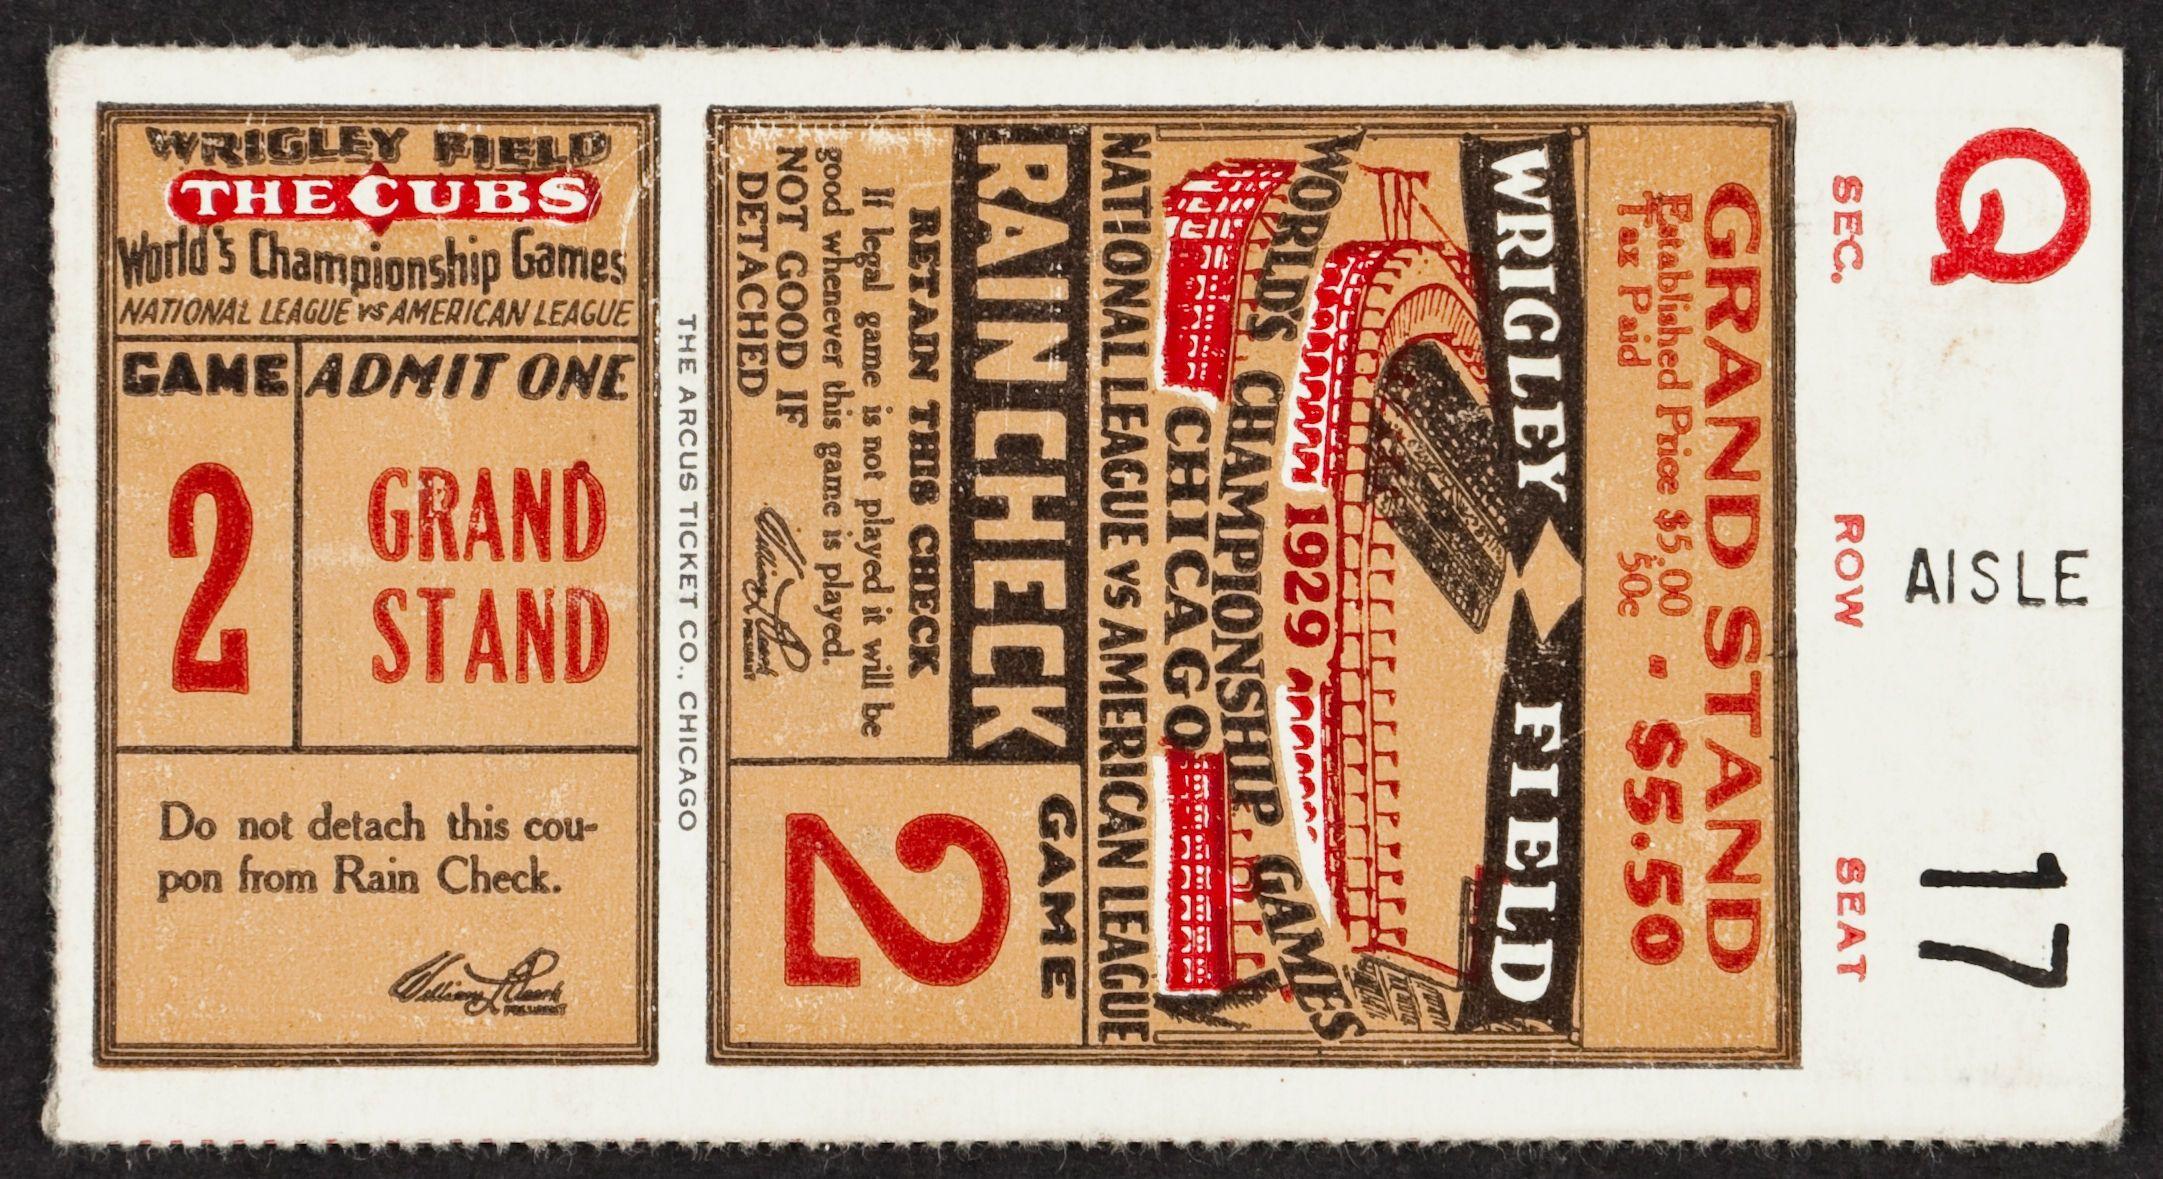 Baseball 1929 World Series Game 2 Ticket Stub. Connie